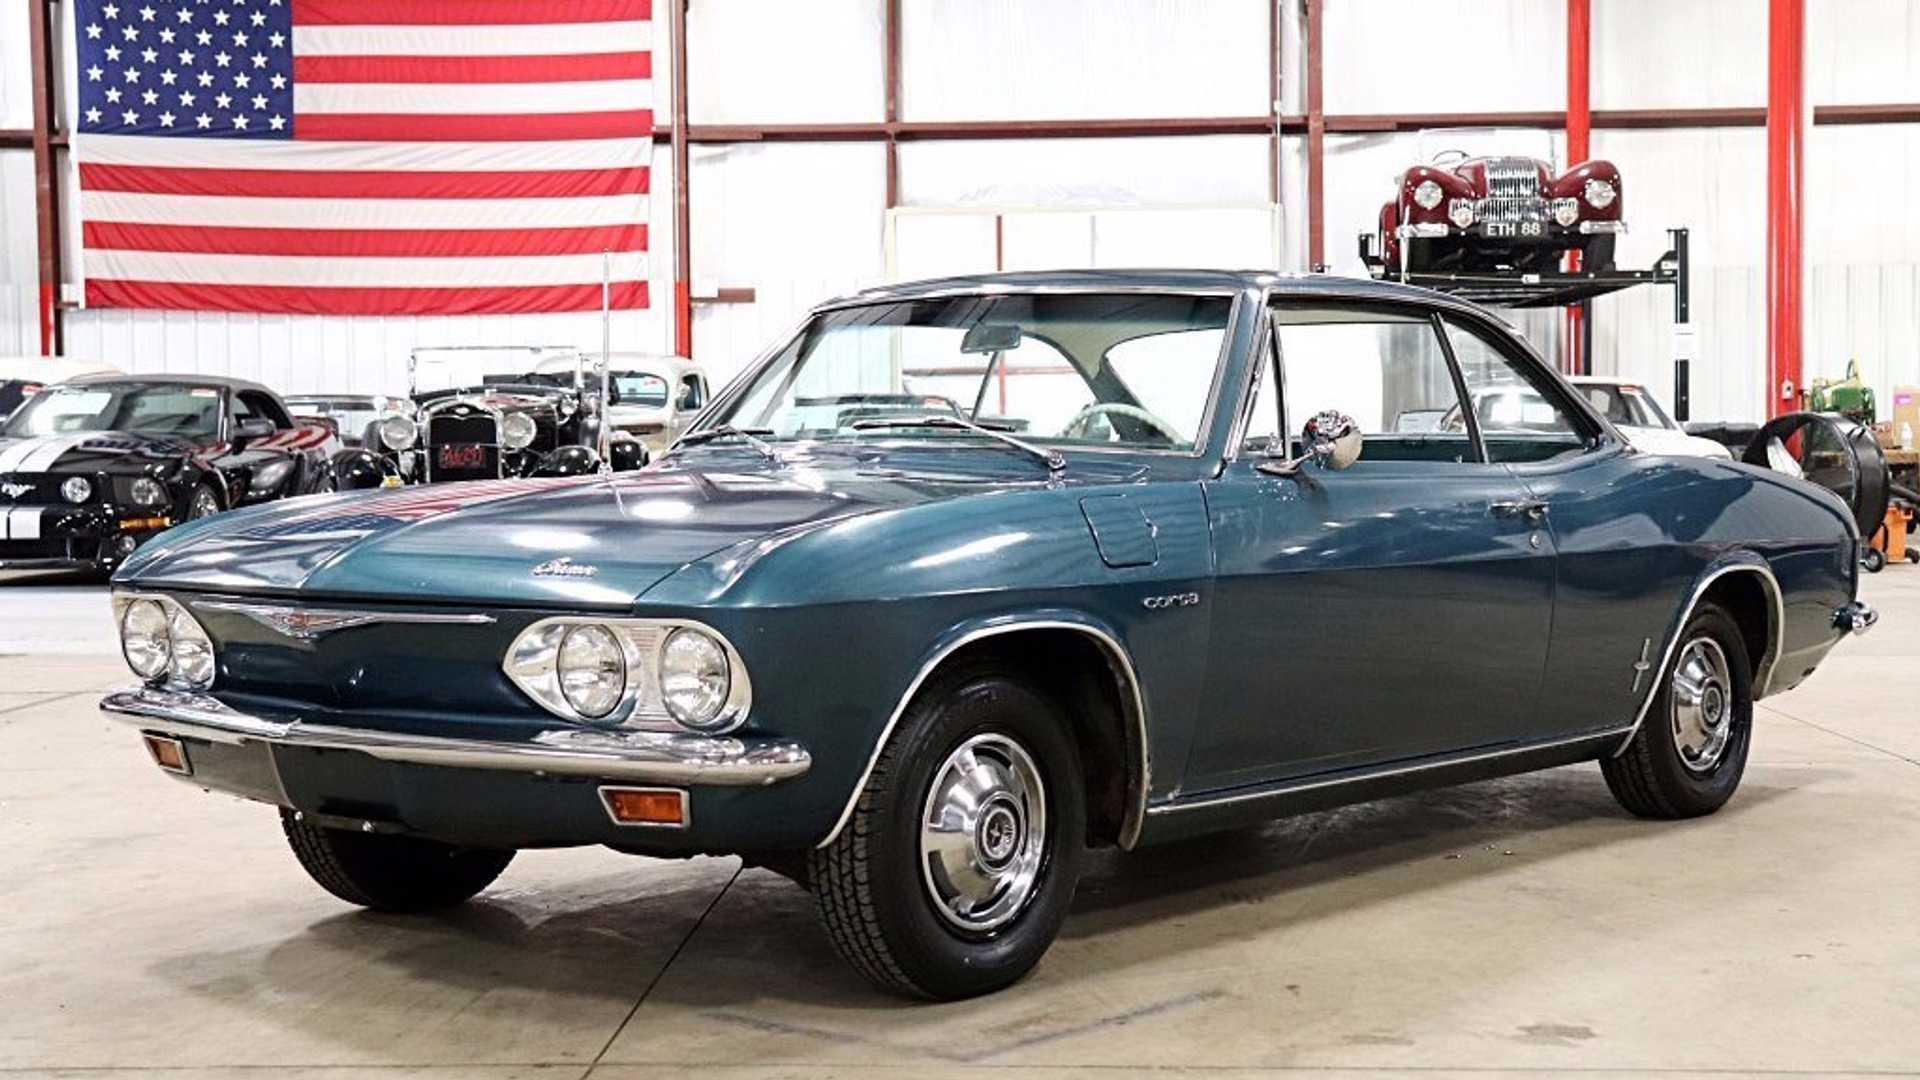 Original And Rare: 1965 Chevrolet Corvair Corsa Turbo Coupe